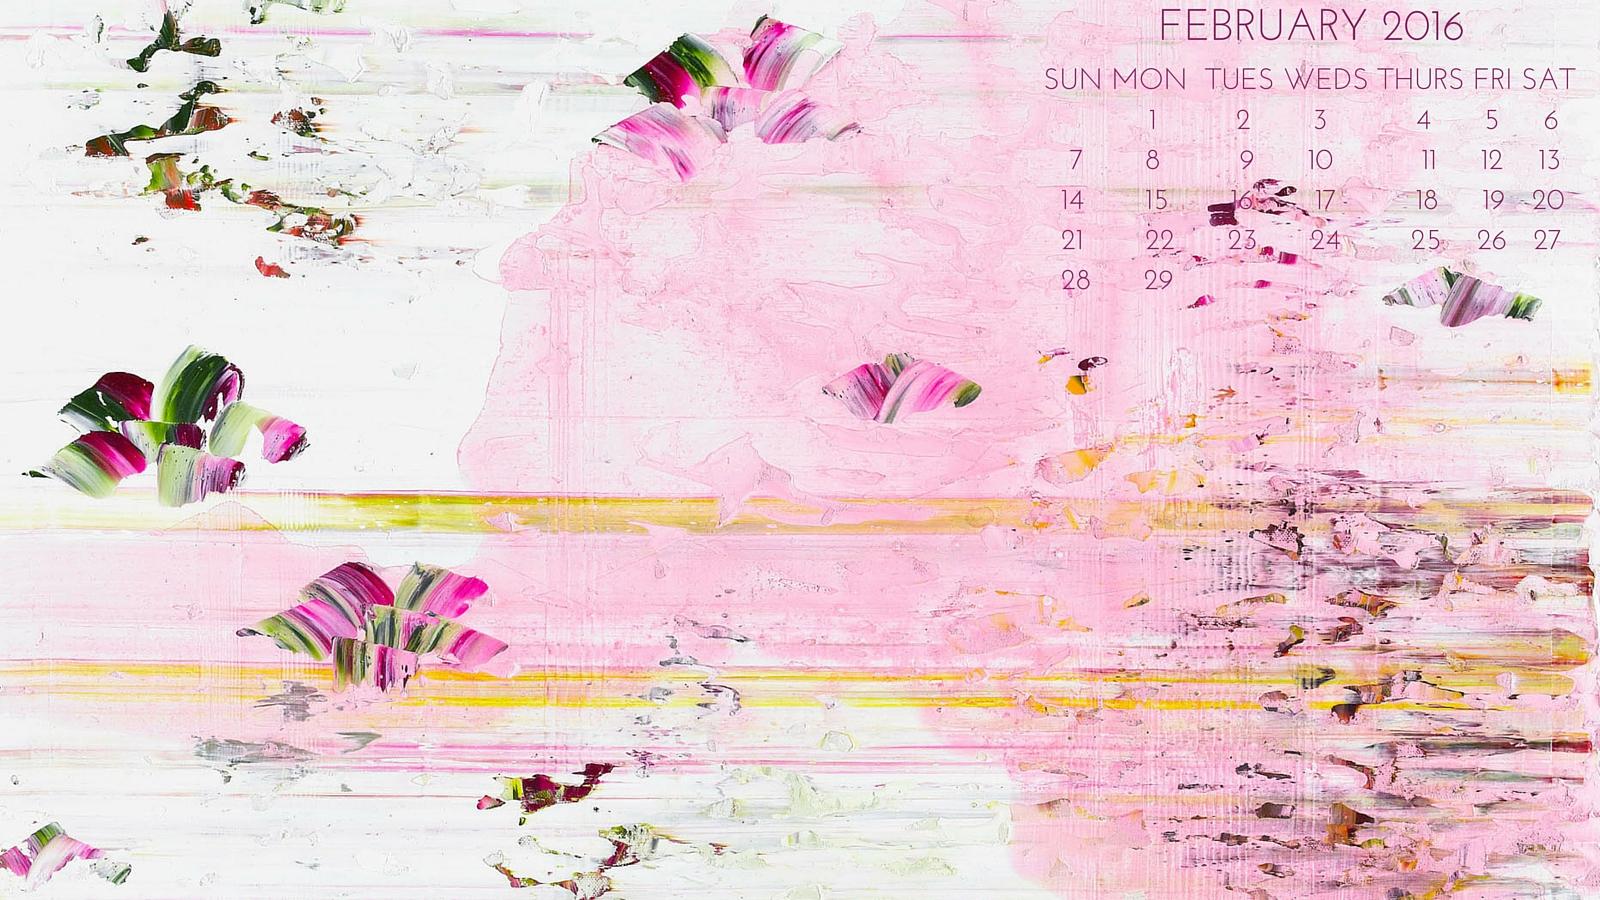 Jessica Zoob Desktop Calendar   FEBRUARY 2016   Jessica Zoob 1600x900